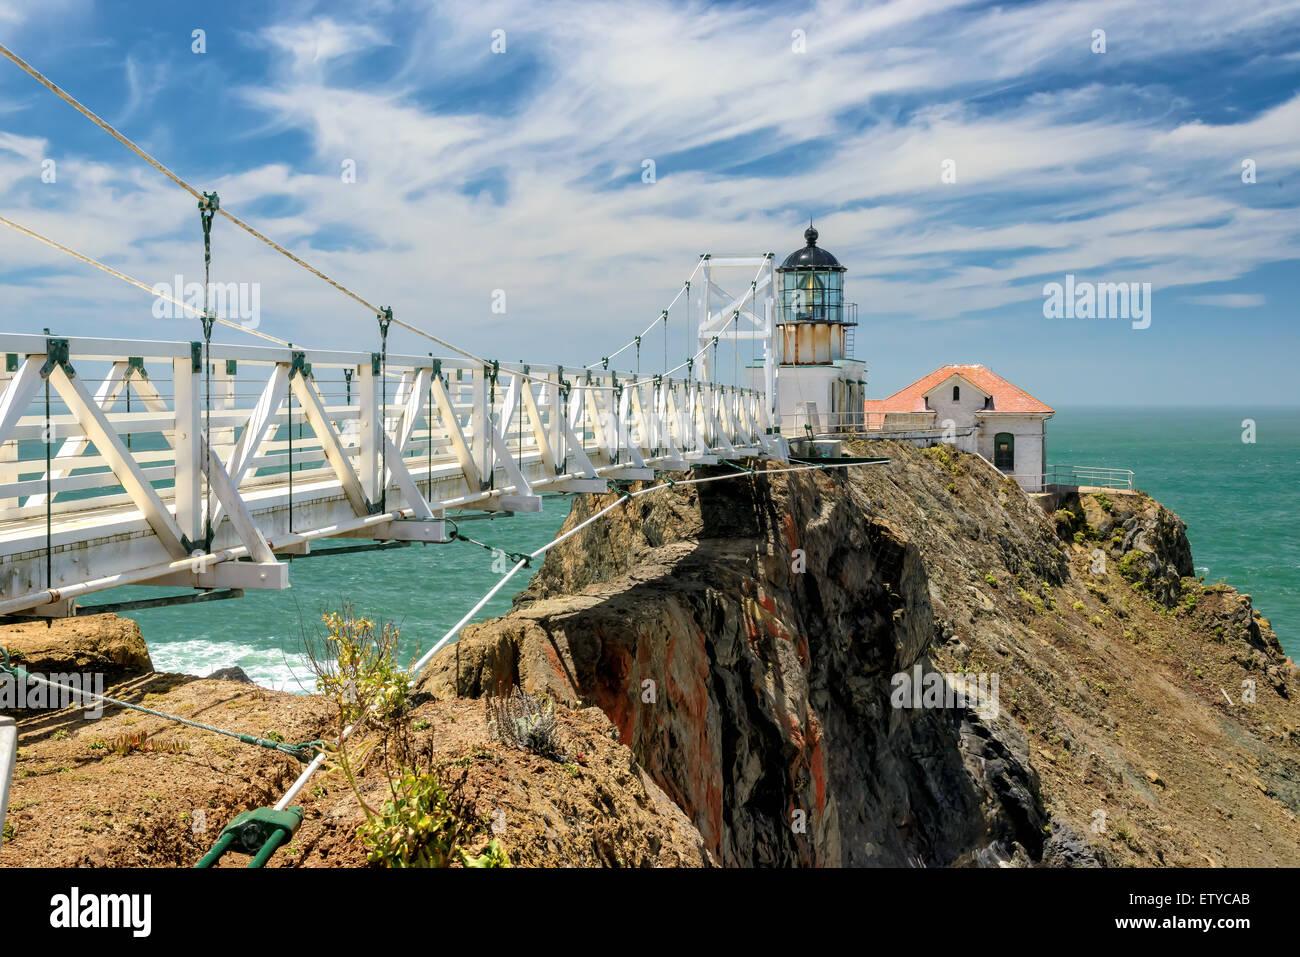 The bridge to Point Bonita Lighthouse on the rock, under beautiful sky, San Francisco, California - Stock Image